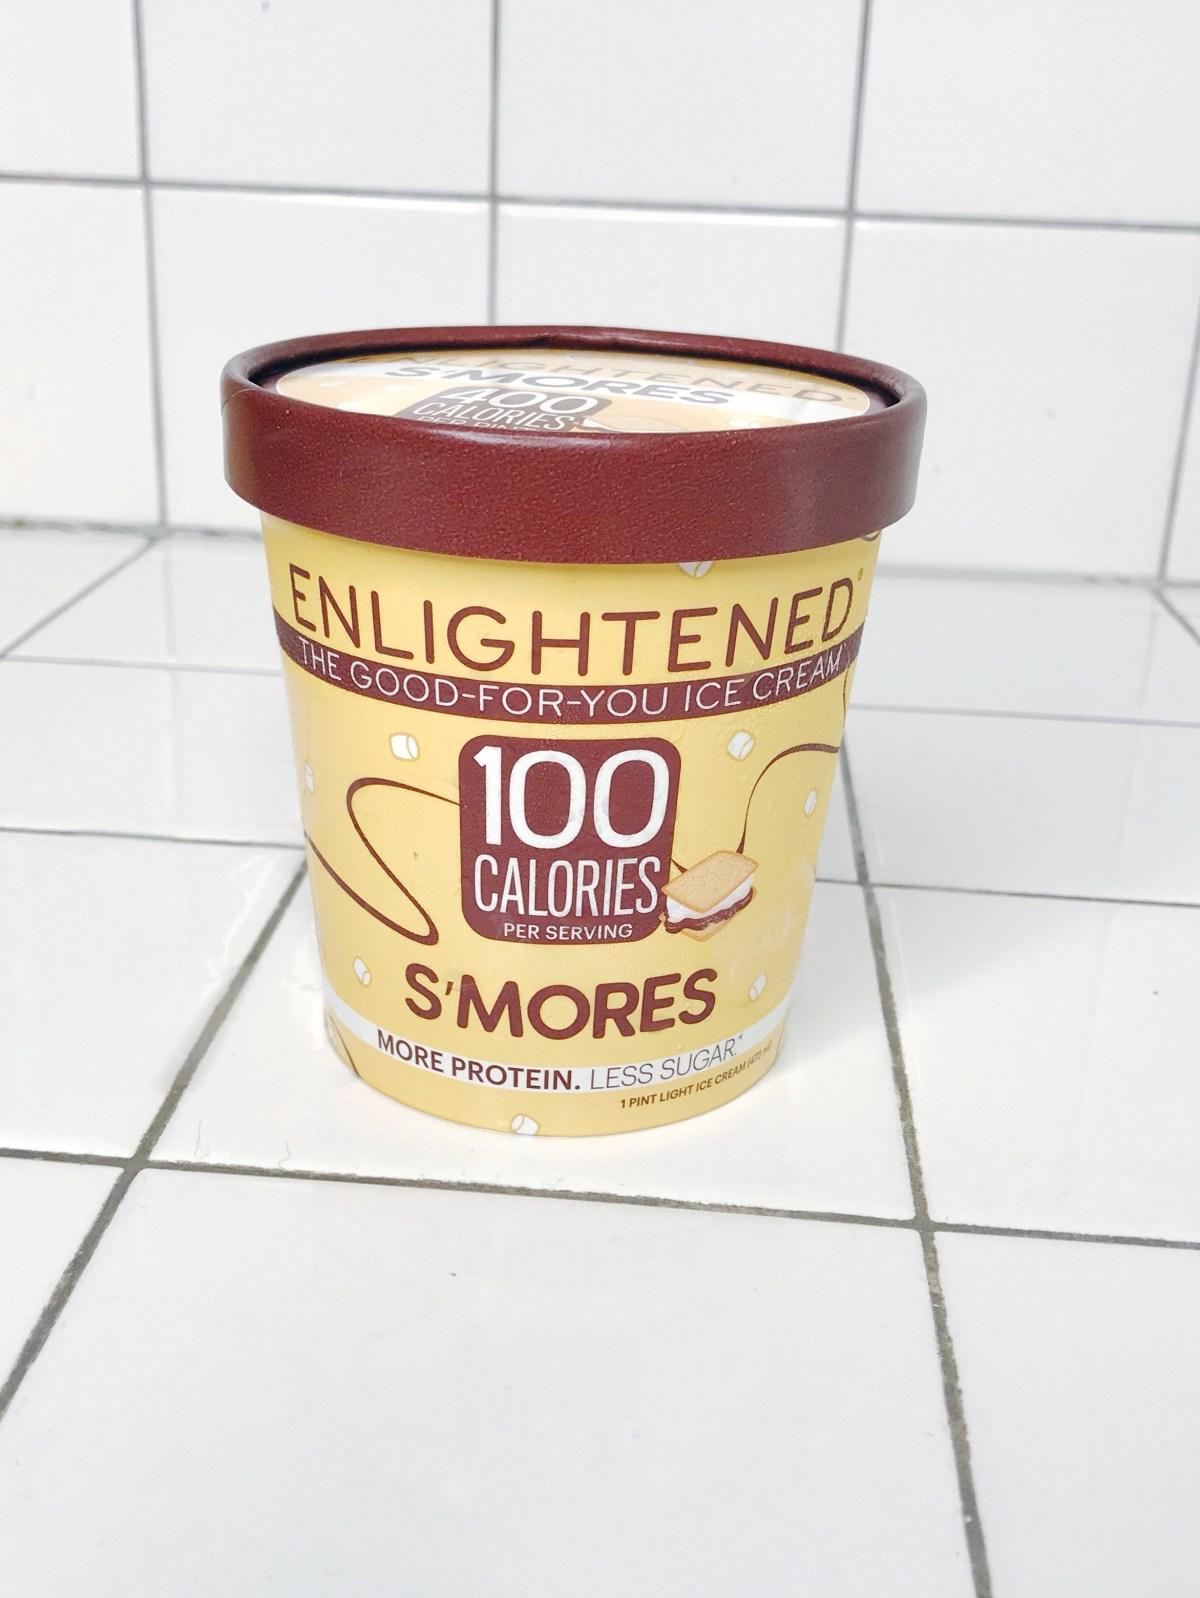 enlightened s'mores